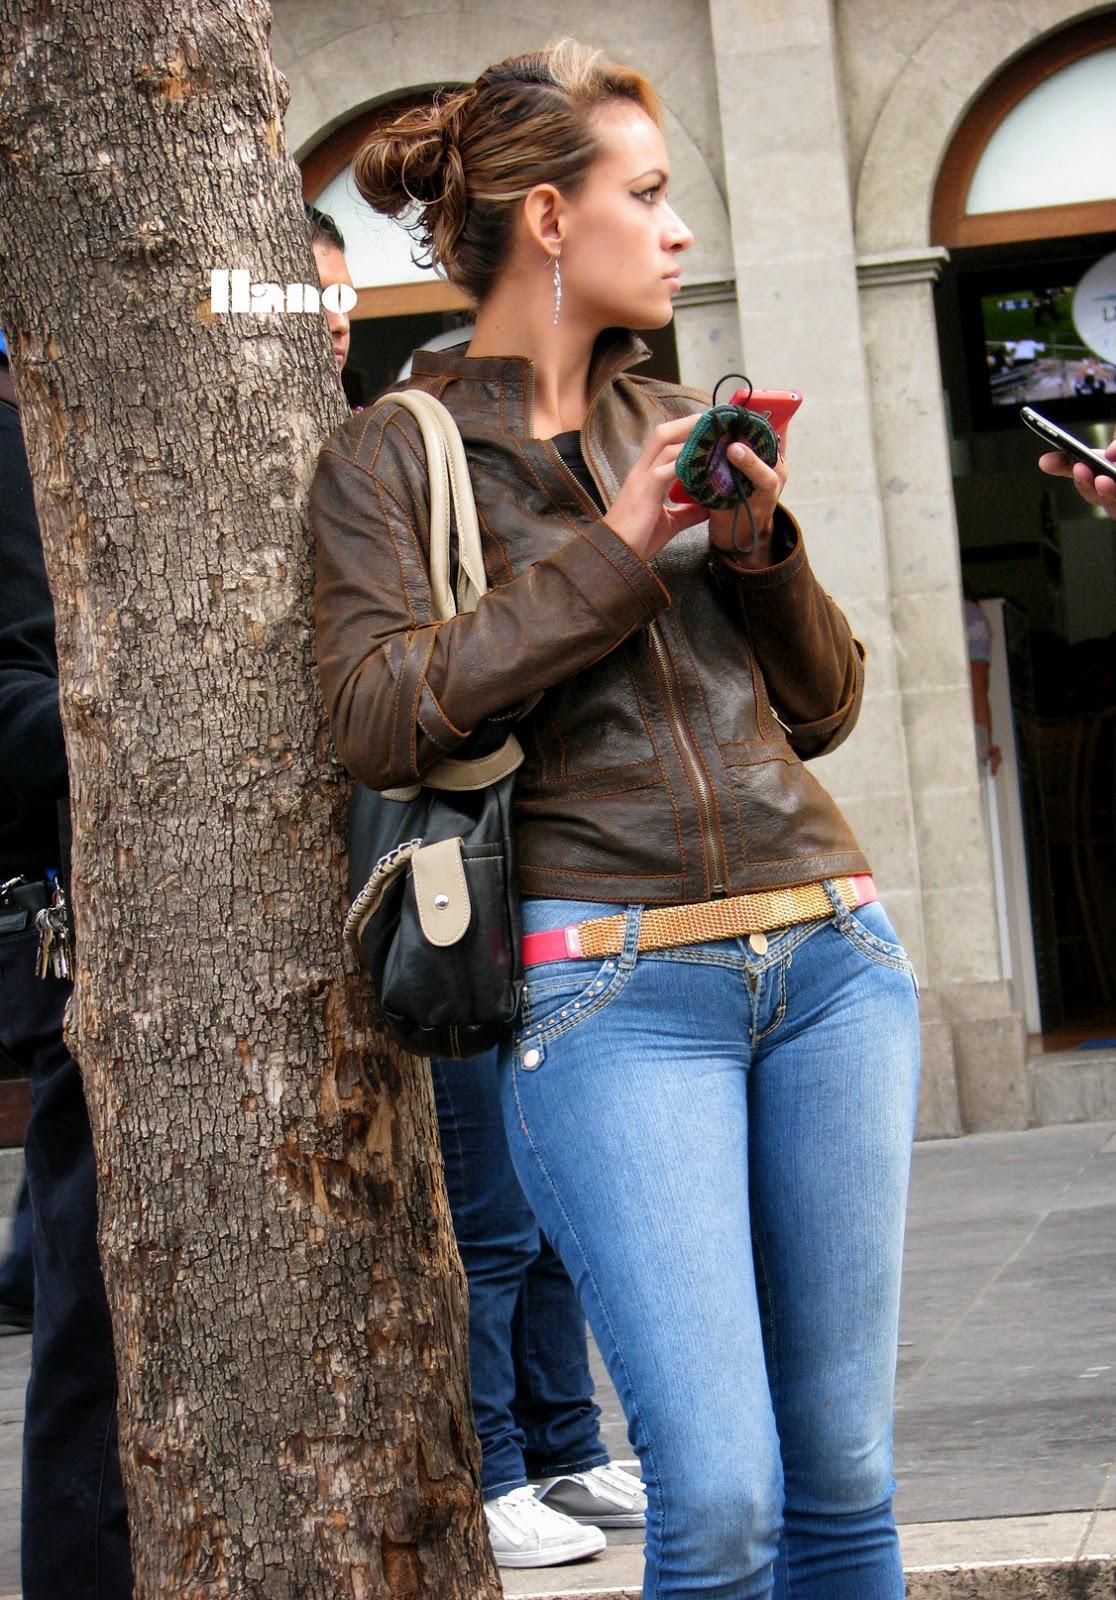 image Cameltoe jeans perfect body latina ass tits pussy amazin